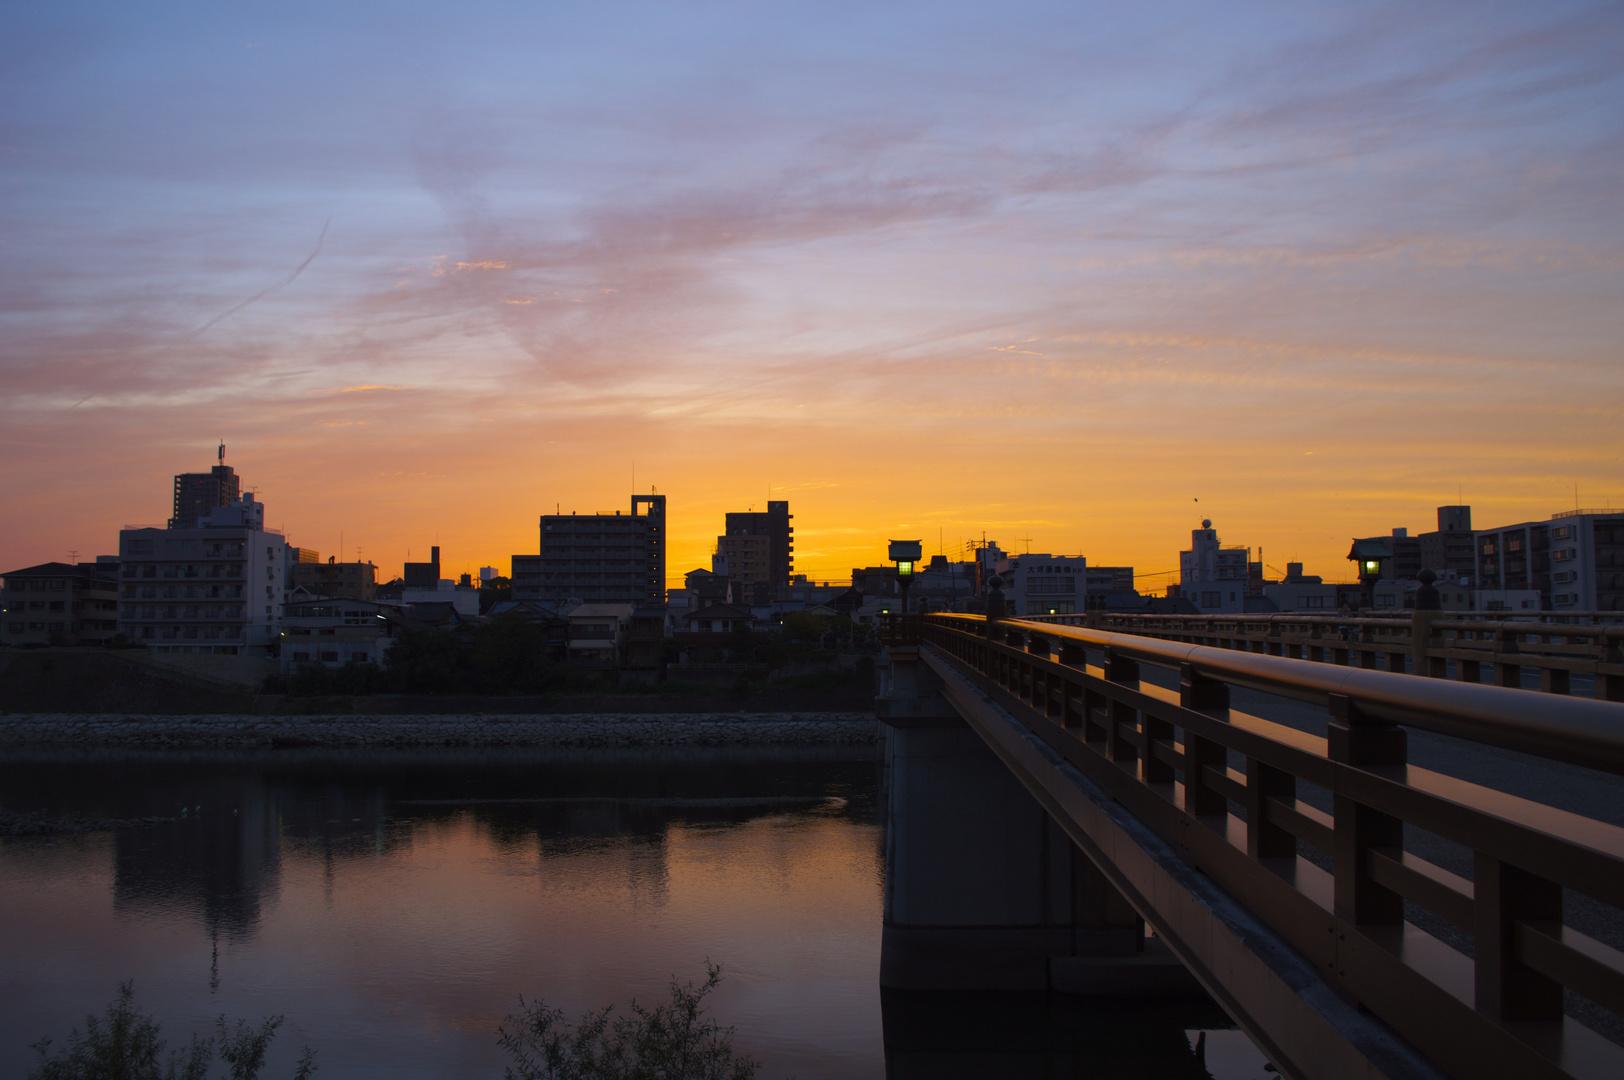 Sonnenuntergang - Okayama